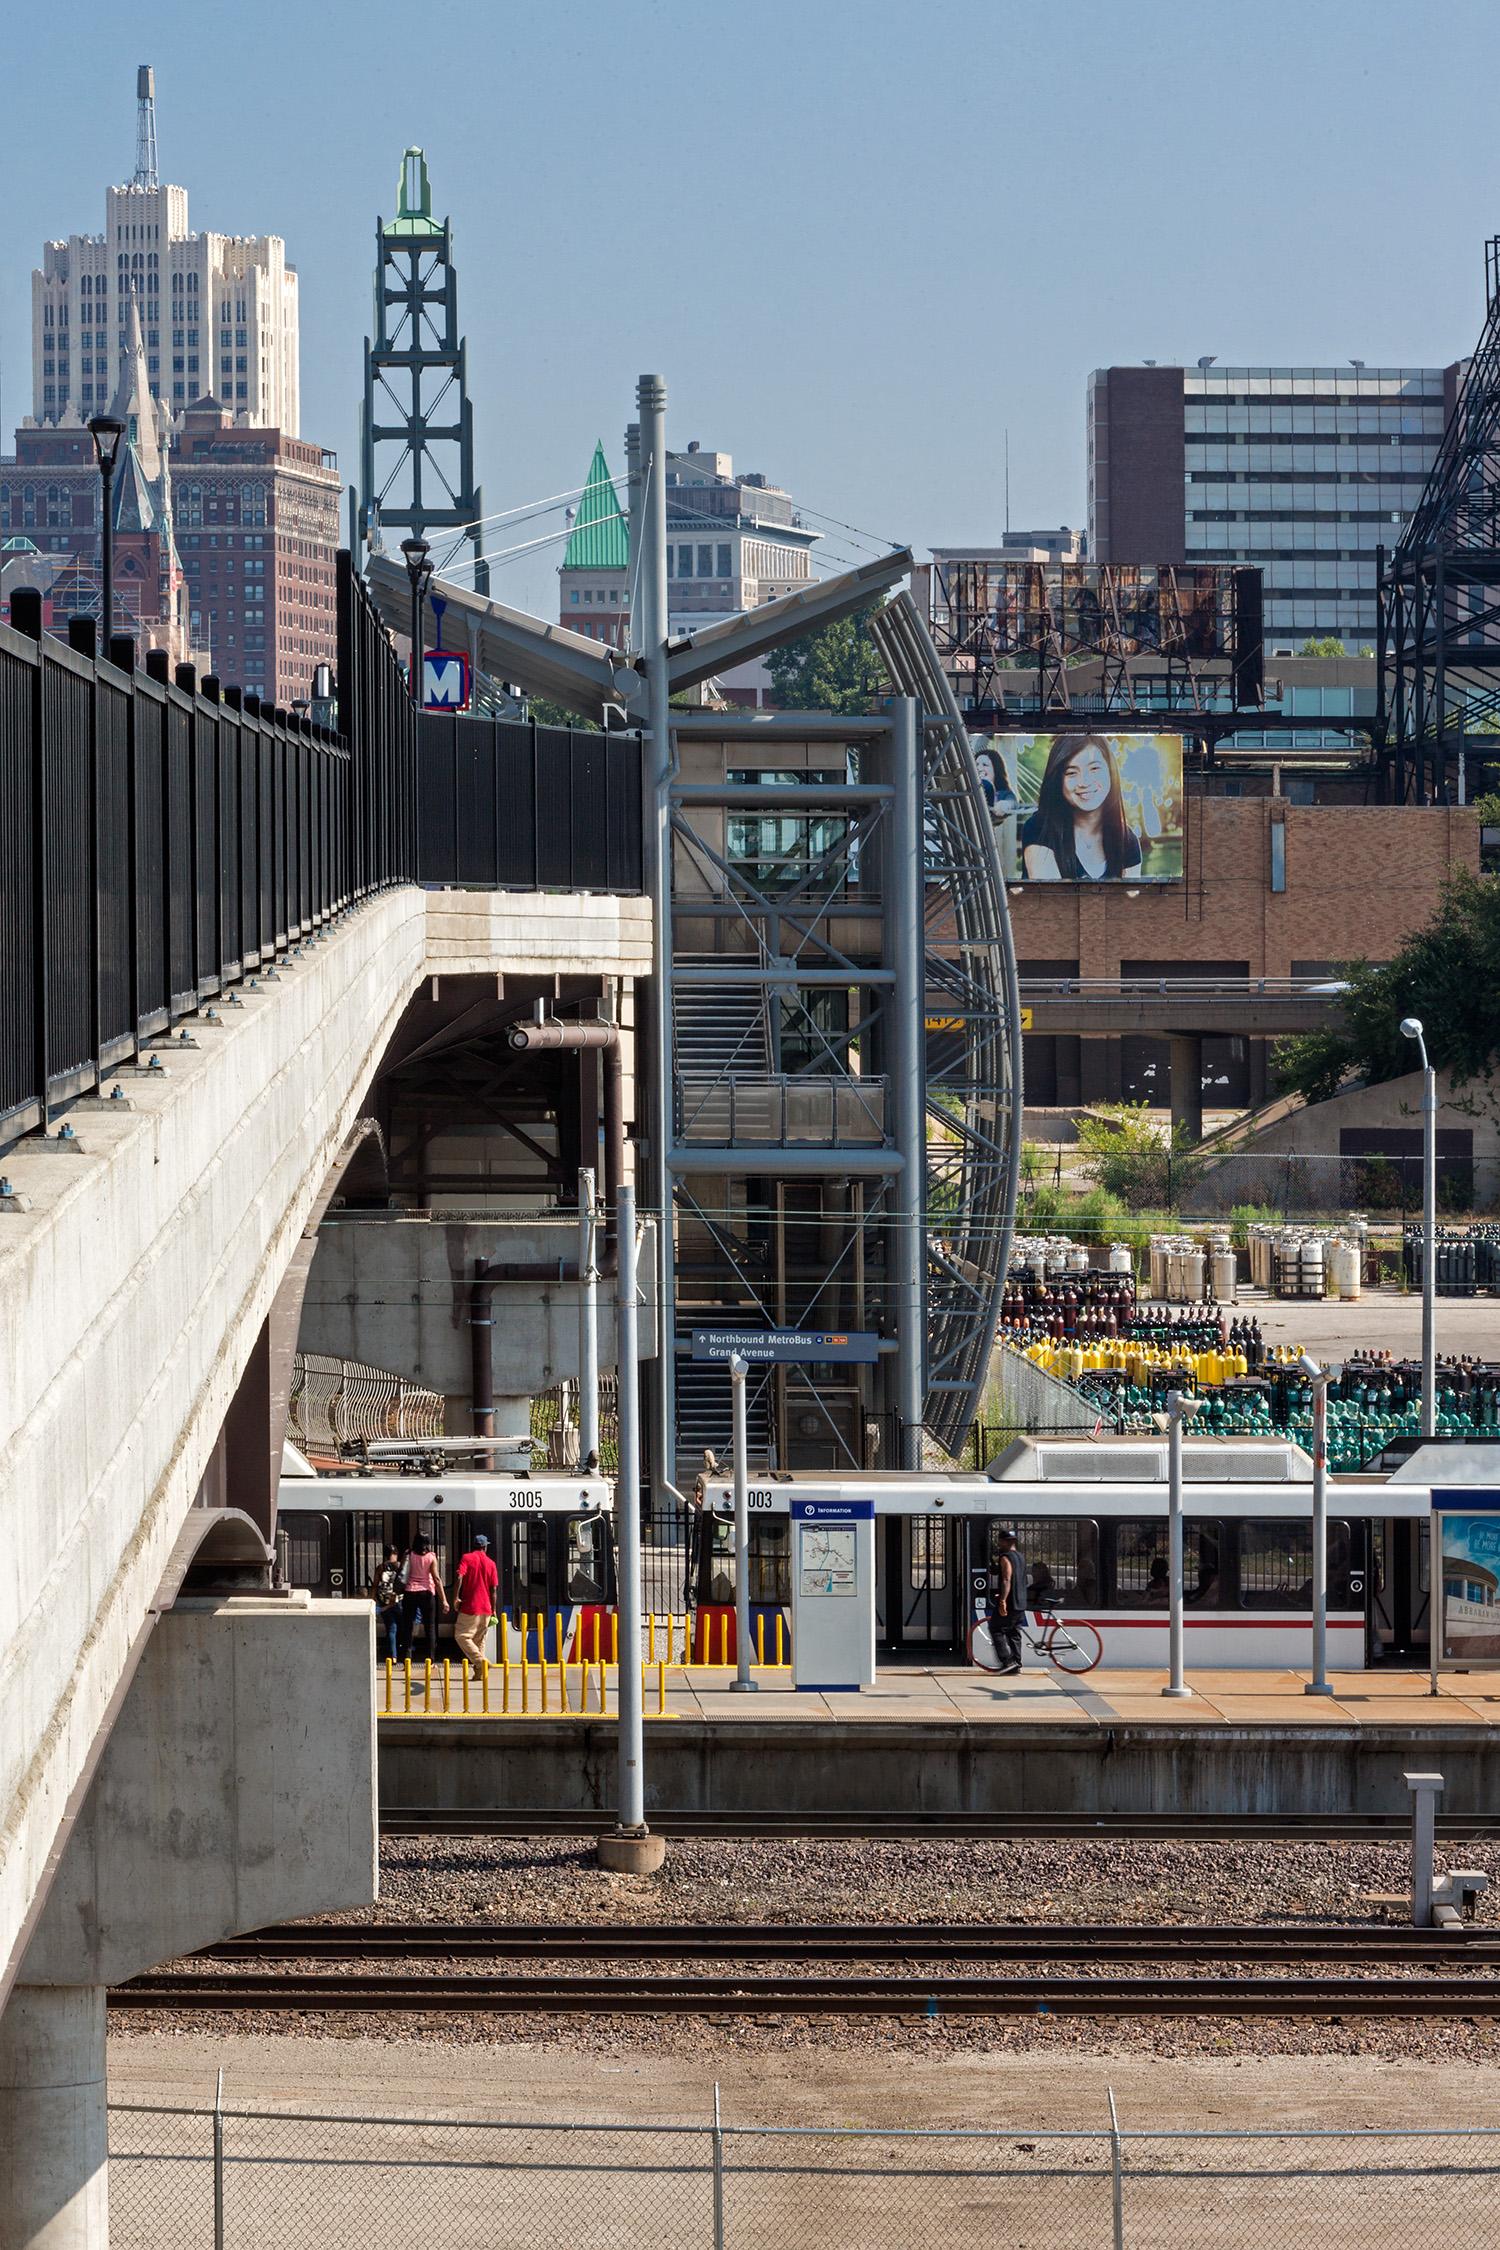 Grand Blvd Bridge & Scott Transit Plaza / St. Louis MO / The Lawrence Group